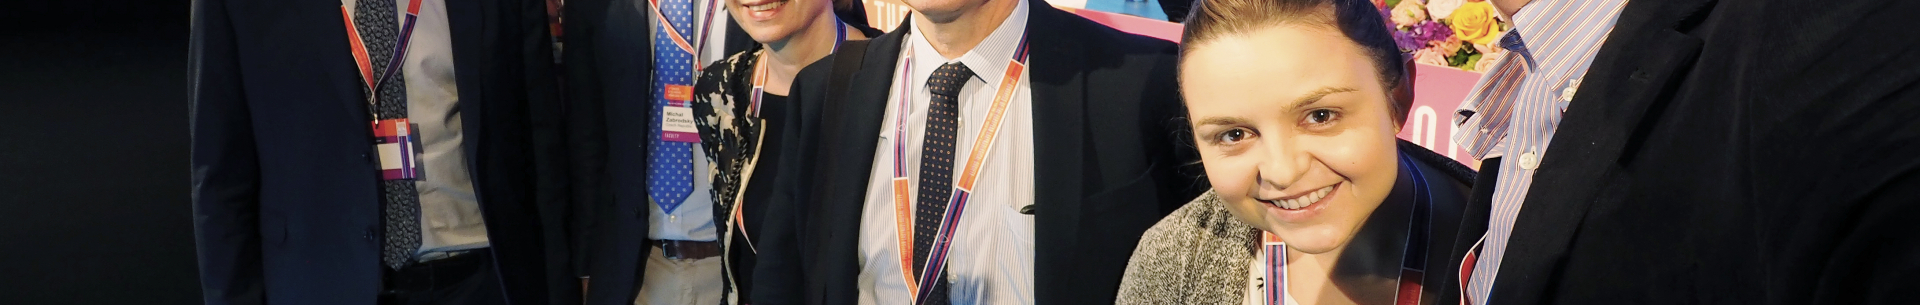 12th CONGRESS OF THE EUROPEAN LARYNGOLOGICAL SOCIETY, 16.-19.5.2018, Londýn